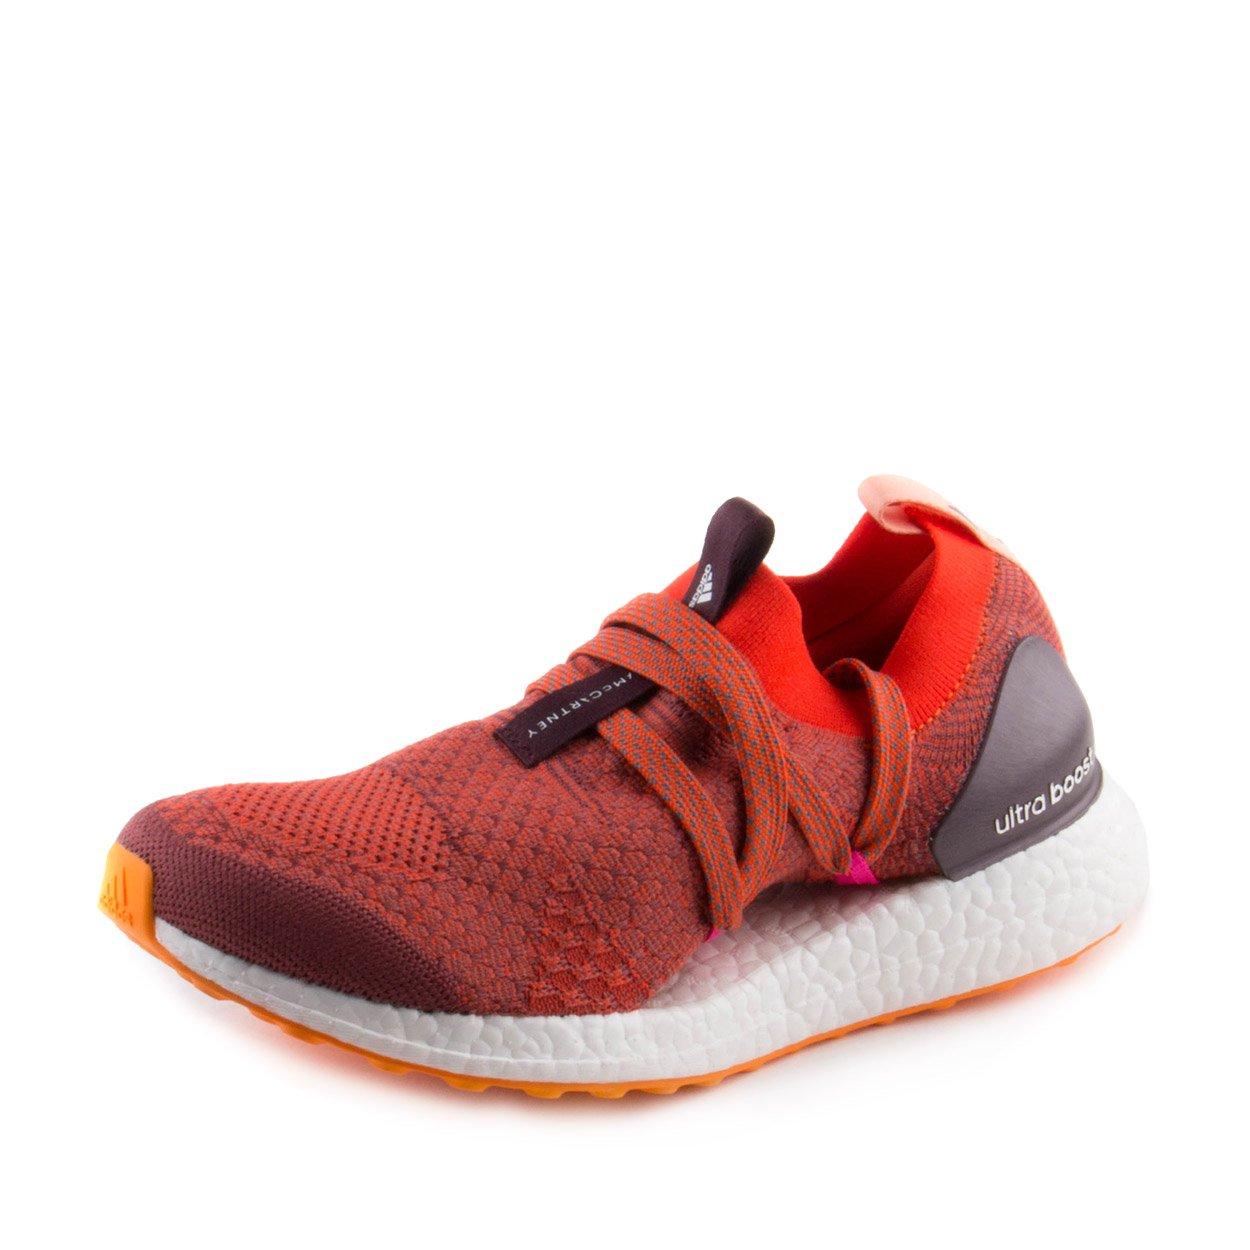 Adidas by Stella McCartney Femmes Ultra Boost X Baskets Clay Rouge/Smc/Radiant Orange F Apricot Rose/Smc Vente en gros 215UA